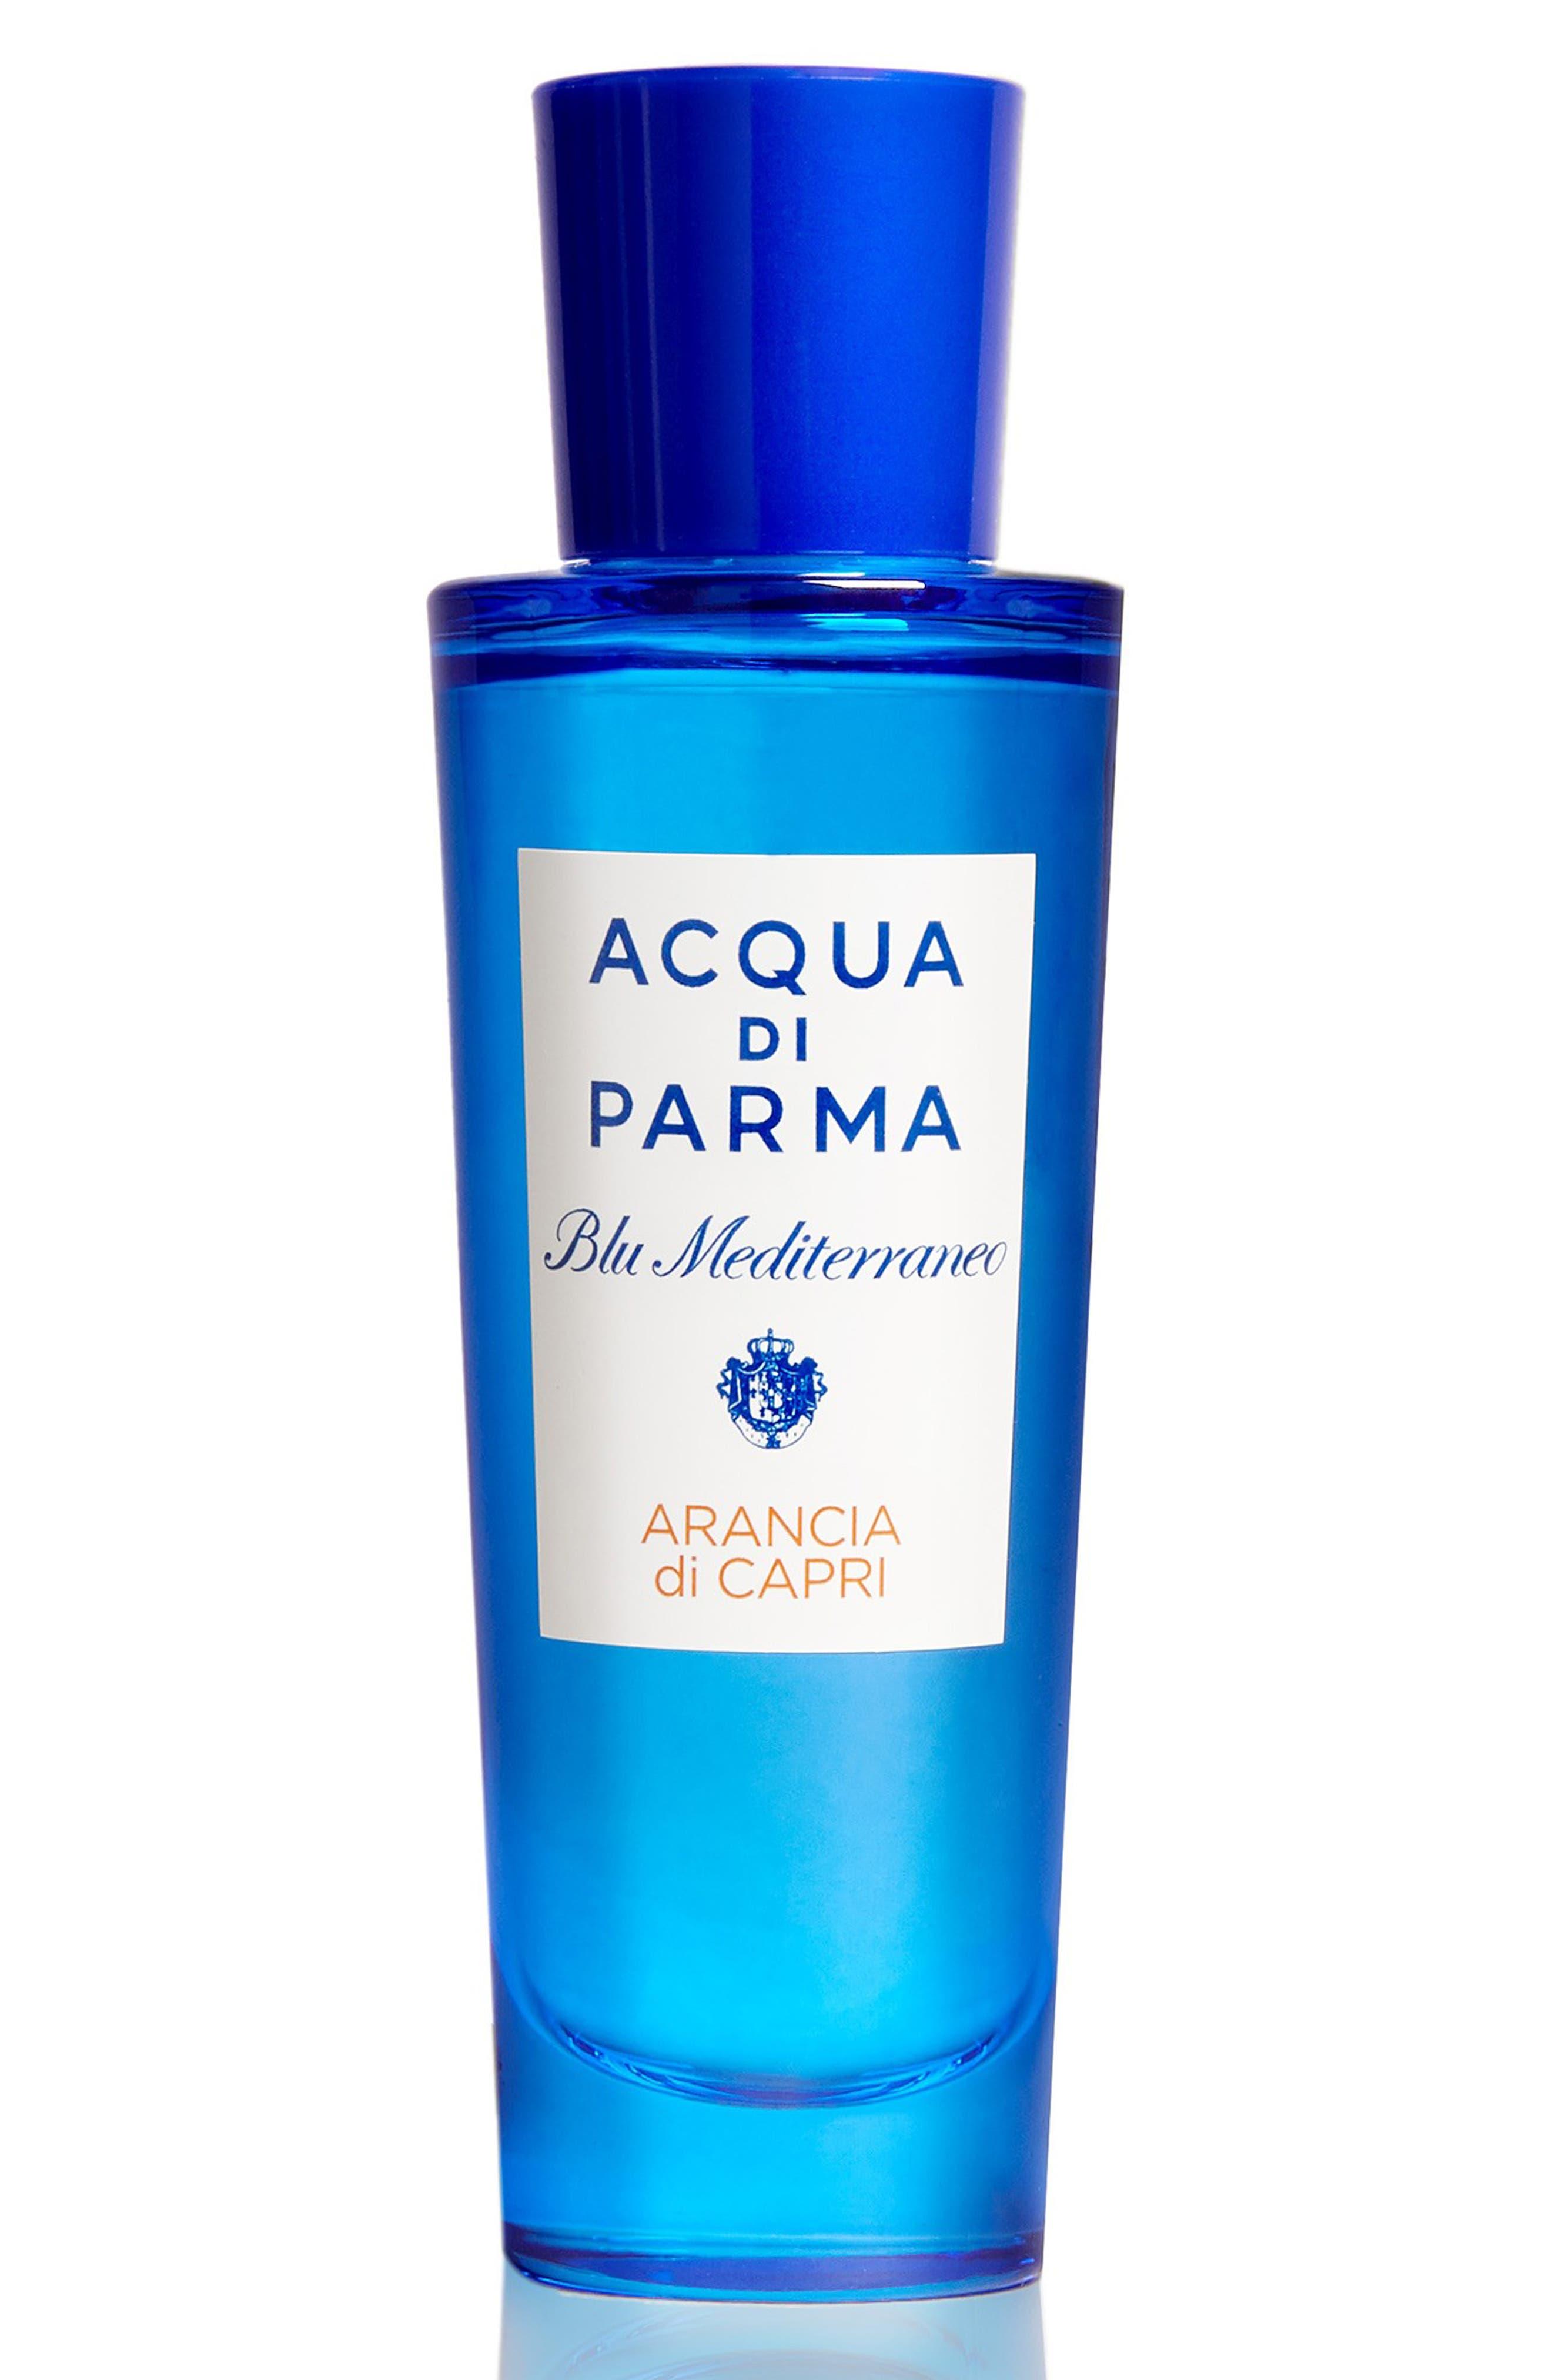 ACQUA DI PARMA, Blu Mediterraneo Arancia di Capri Eau de Toilette, Alternate thumbnail 6, color, NO COLOR